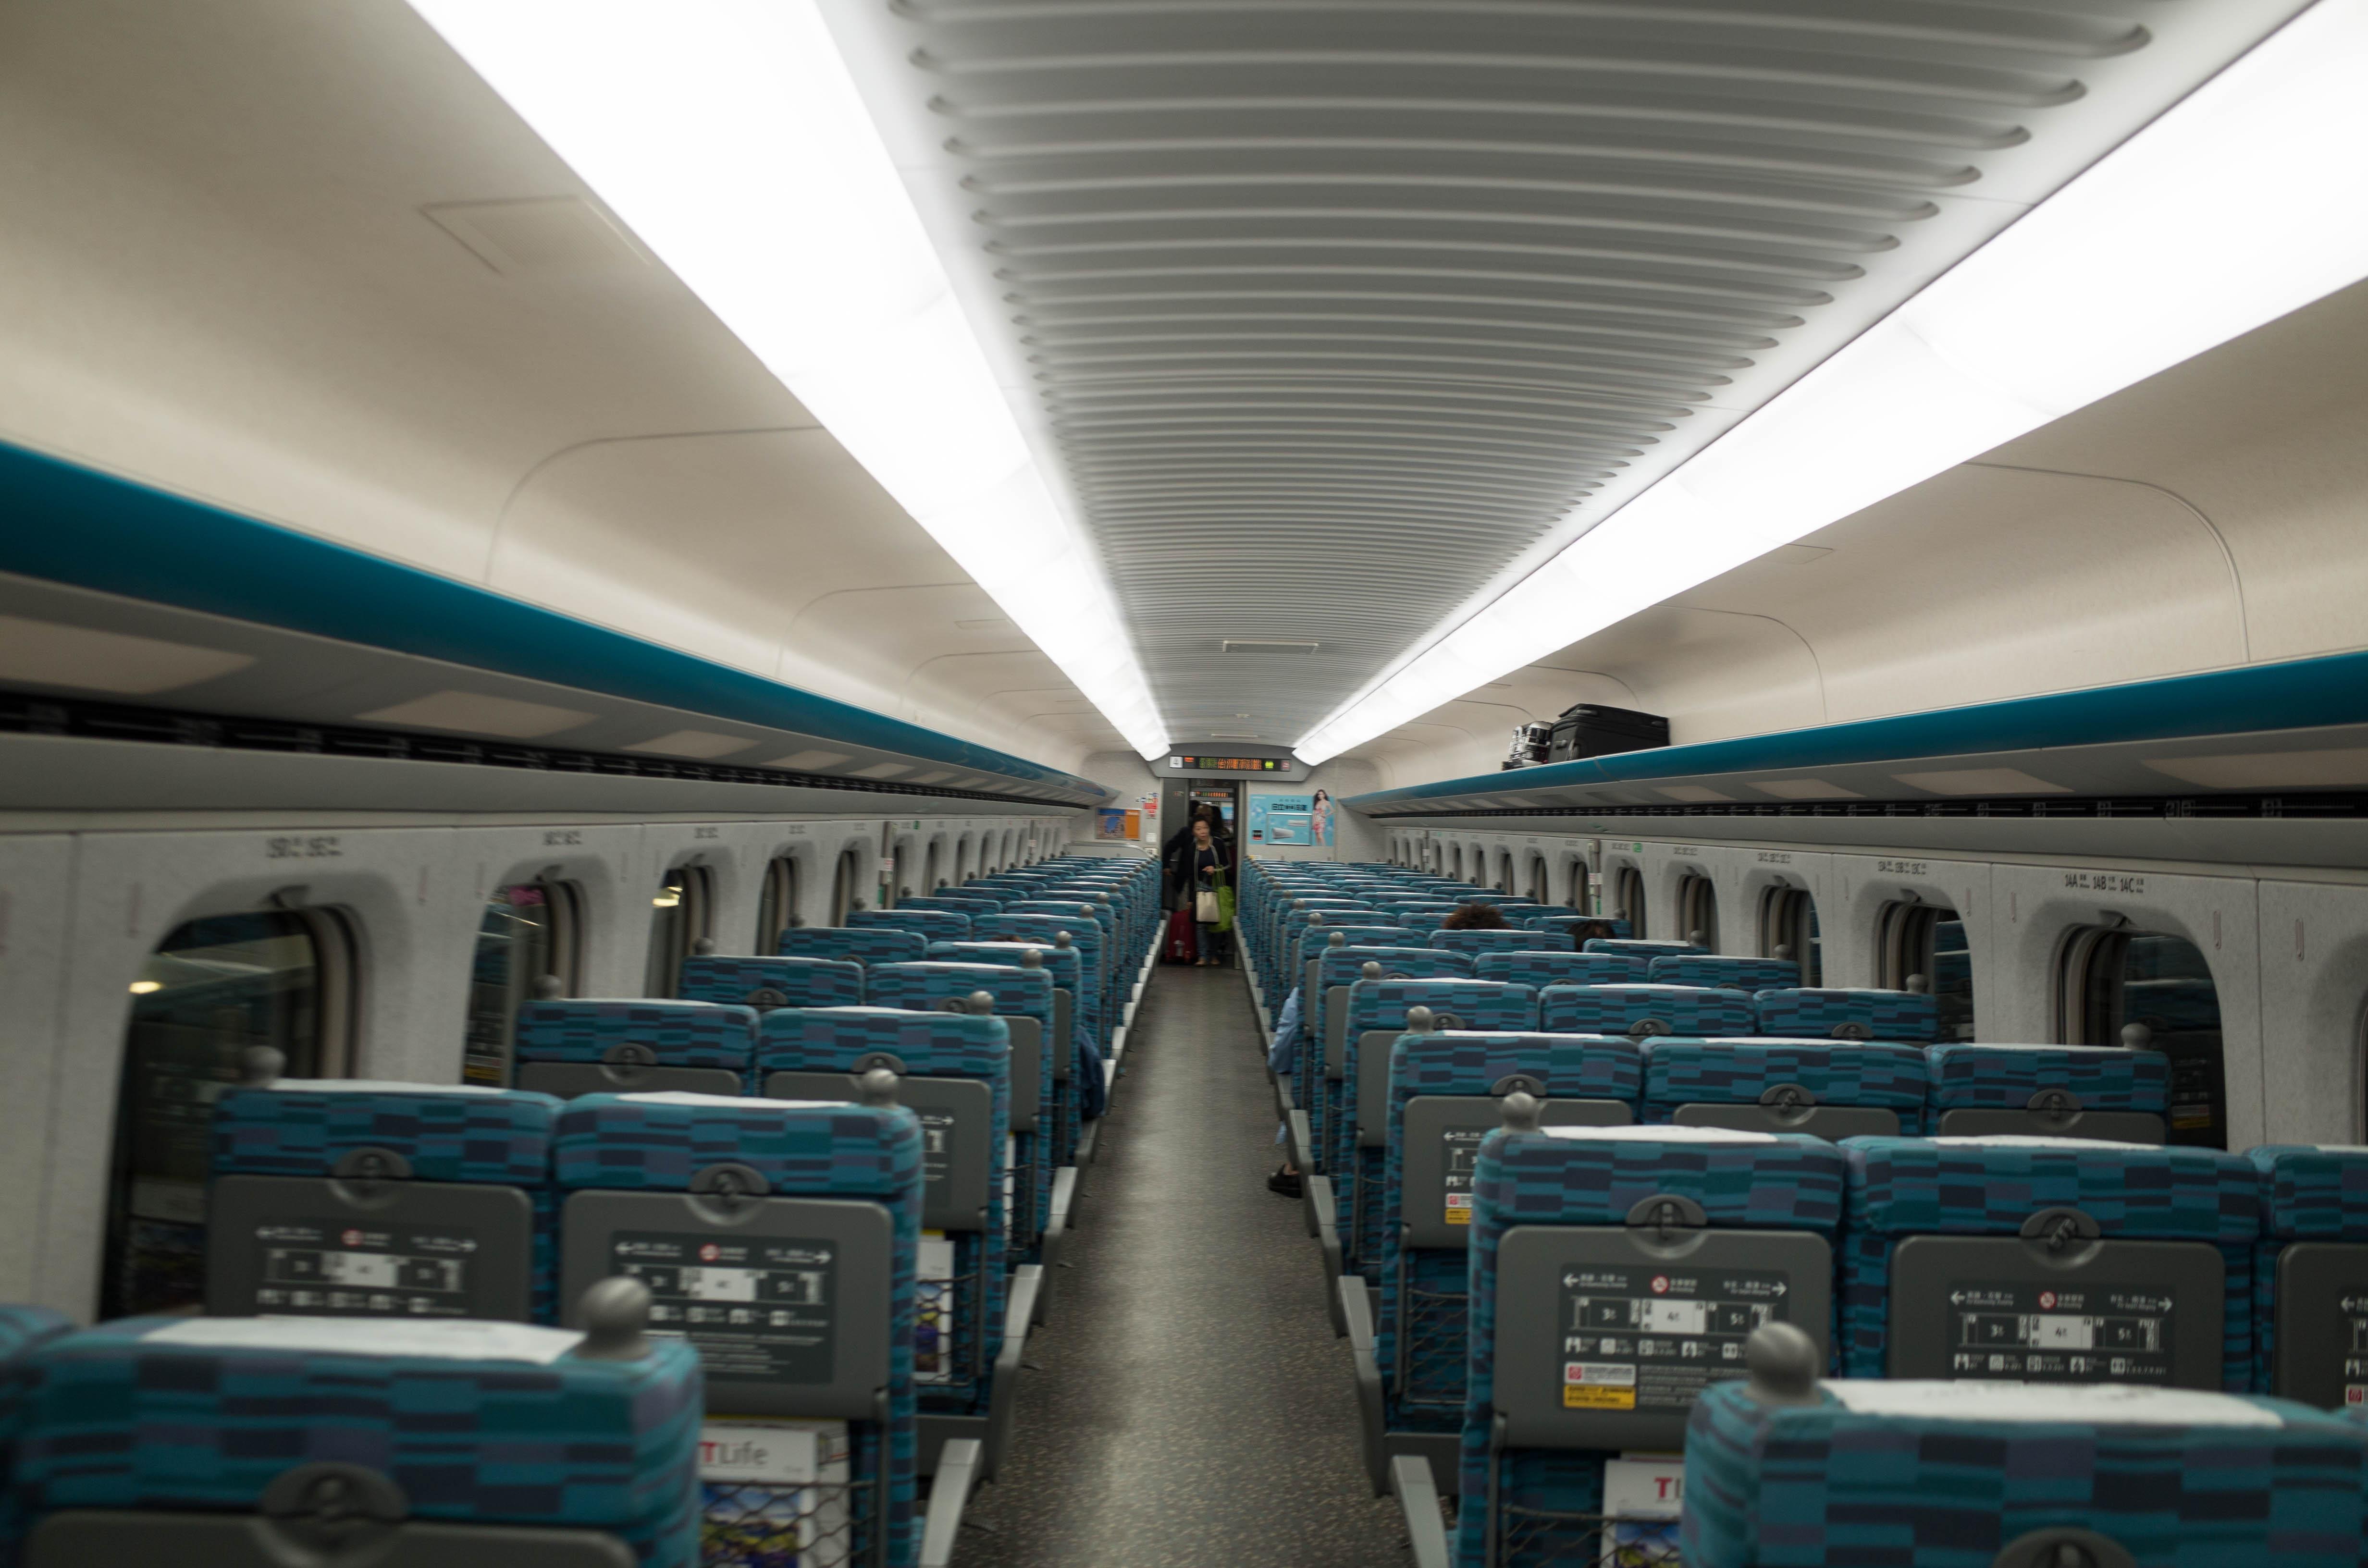 台湾新幹線の車内